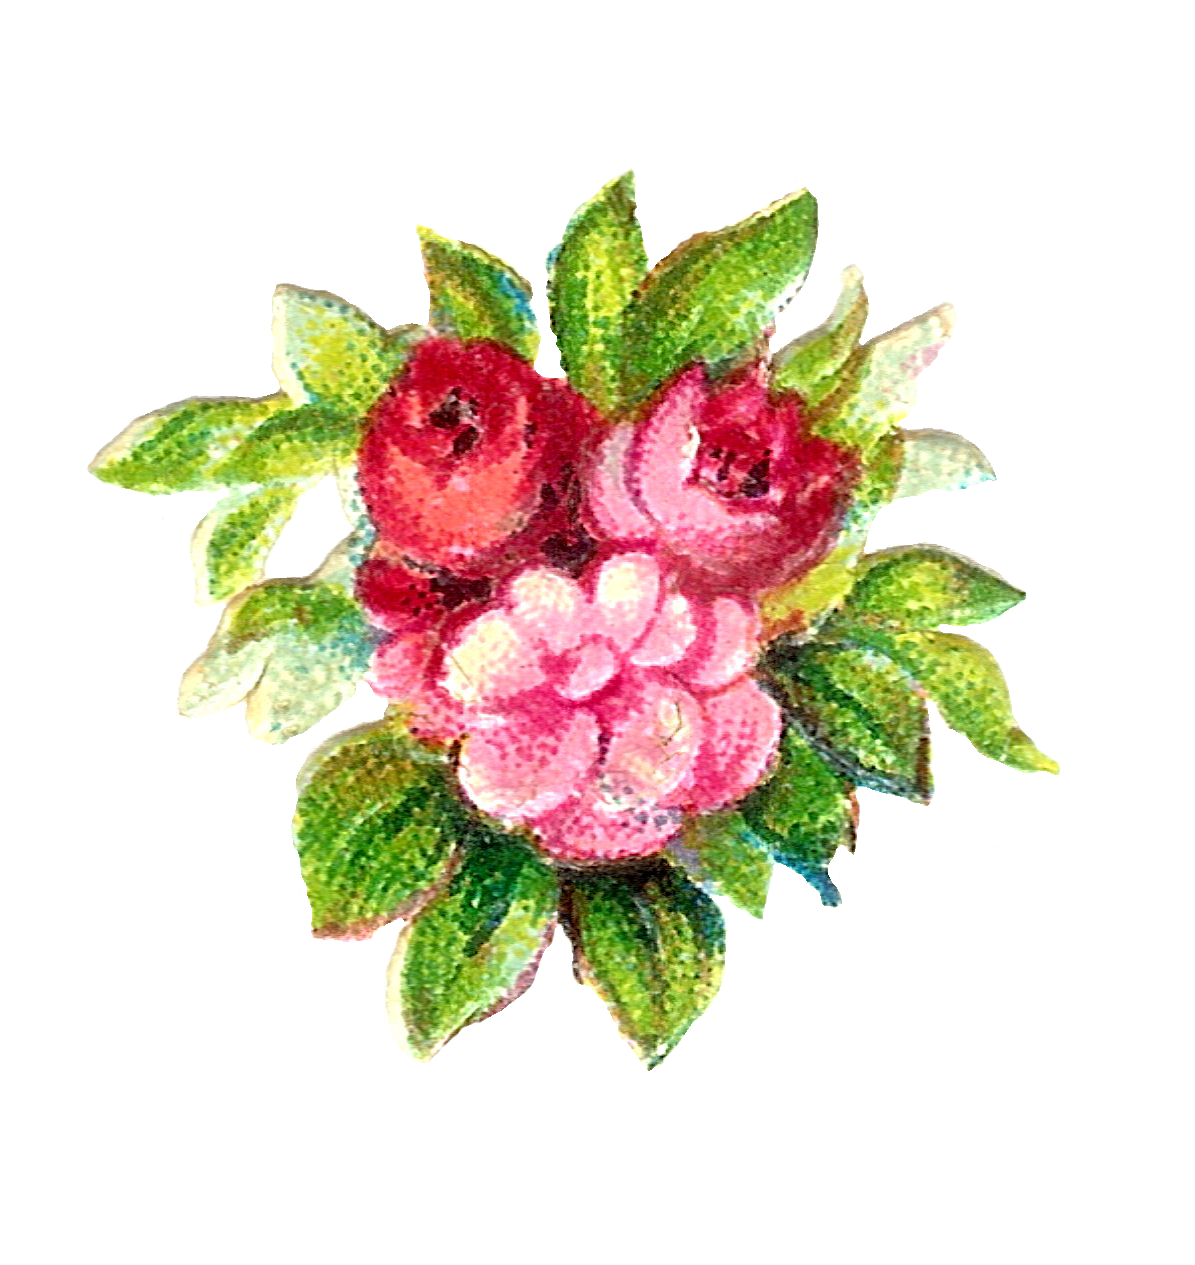 rose flowers digital design - photo #24